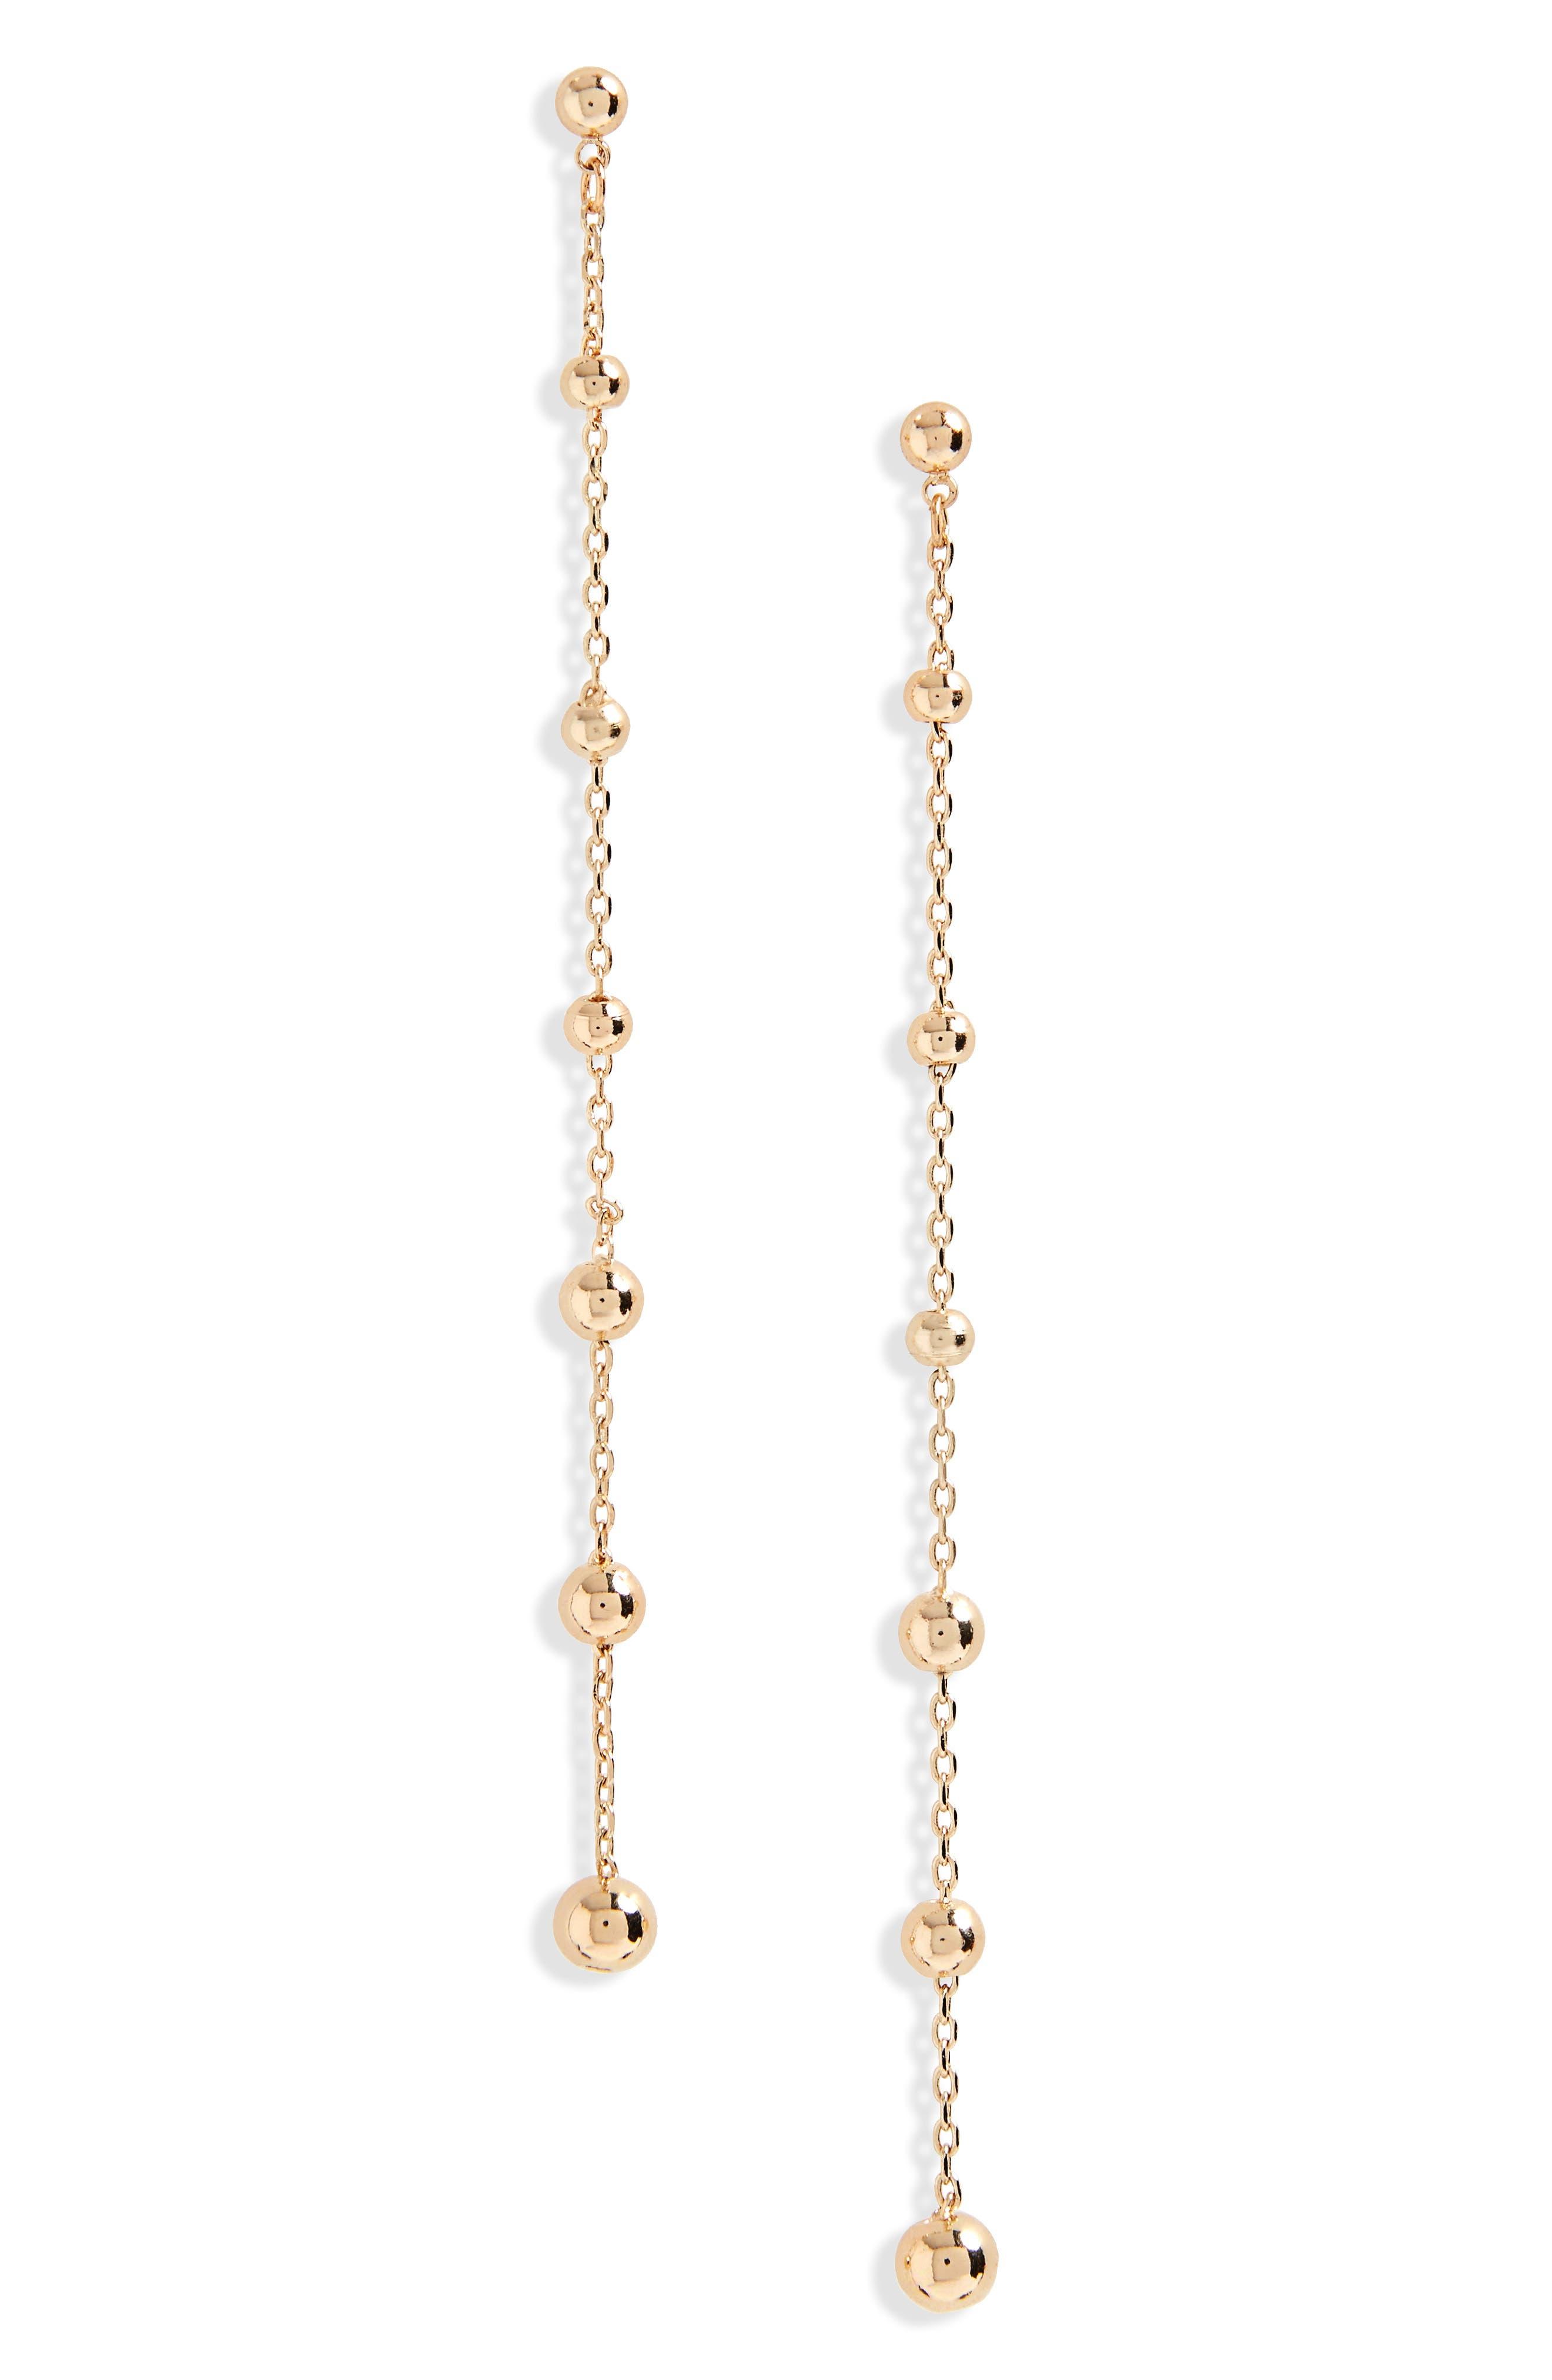 Main Image - BP. Chain & Ball Drop Earrings